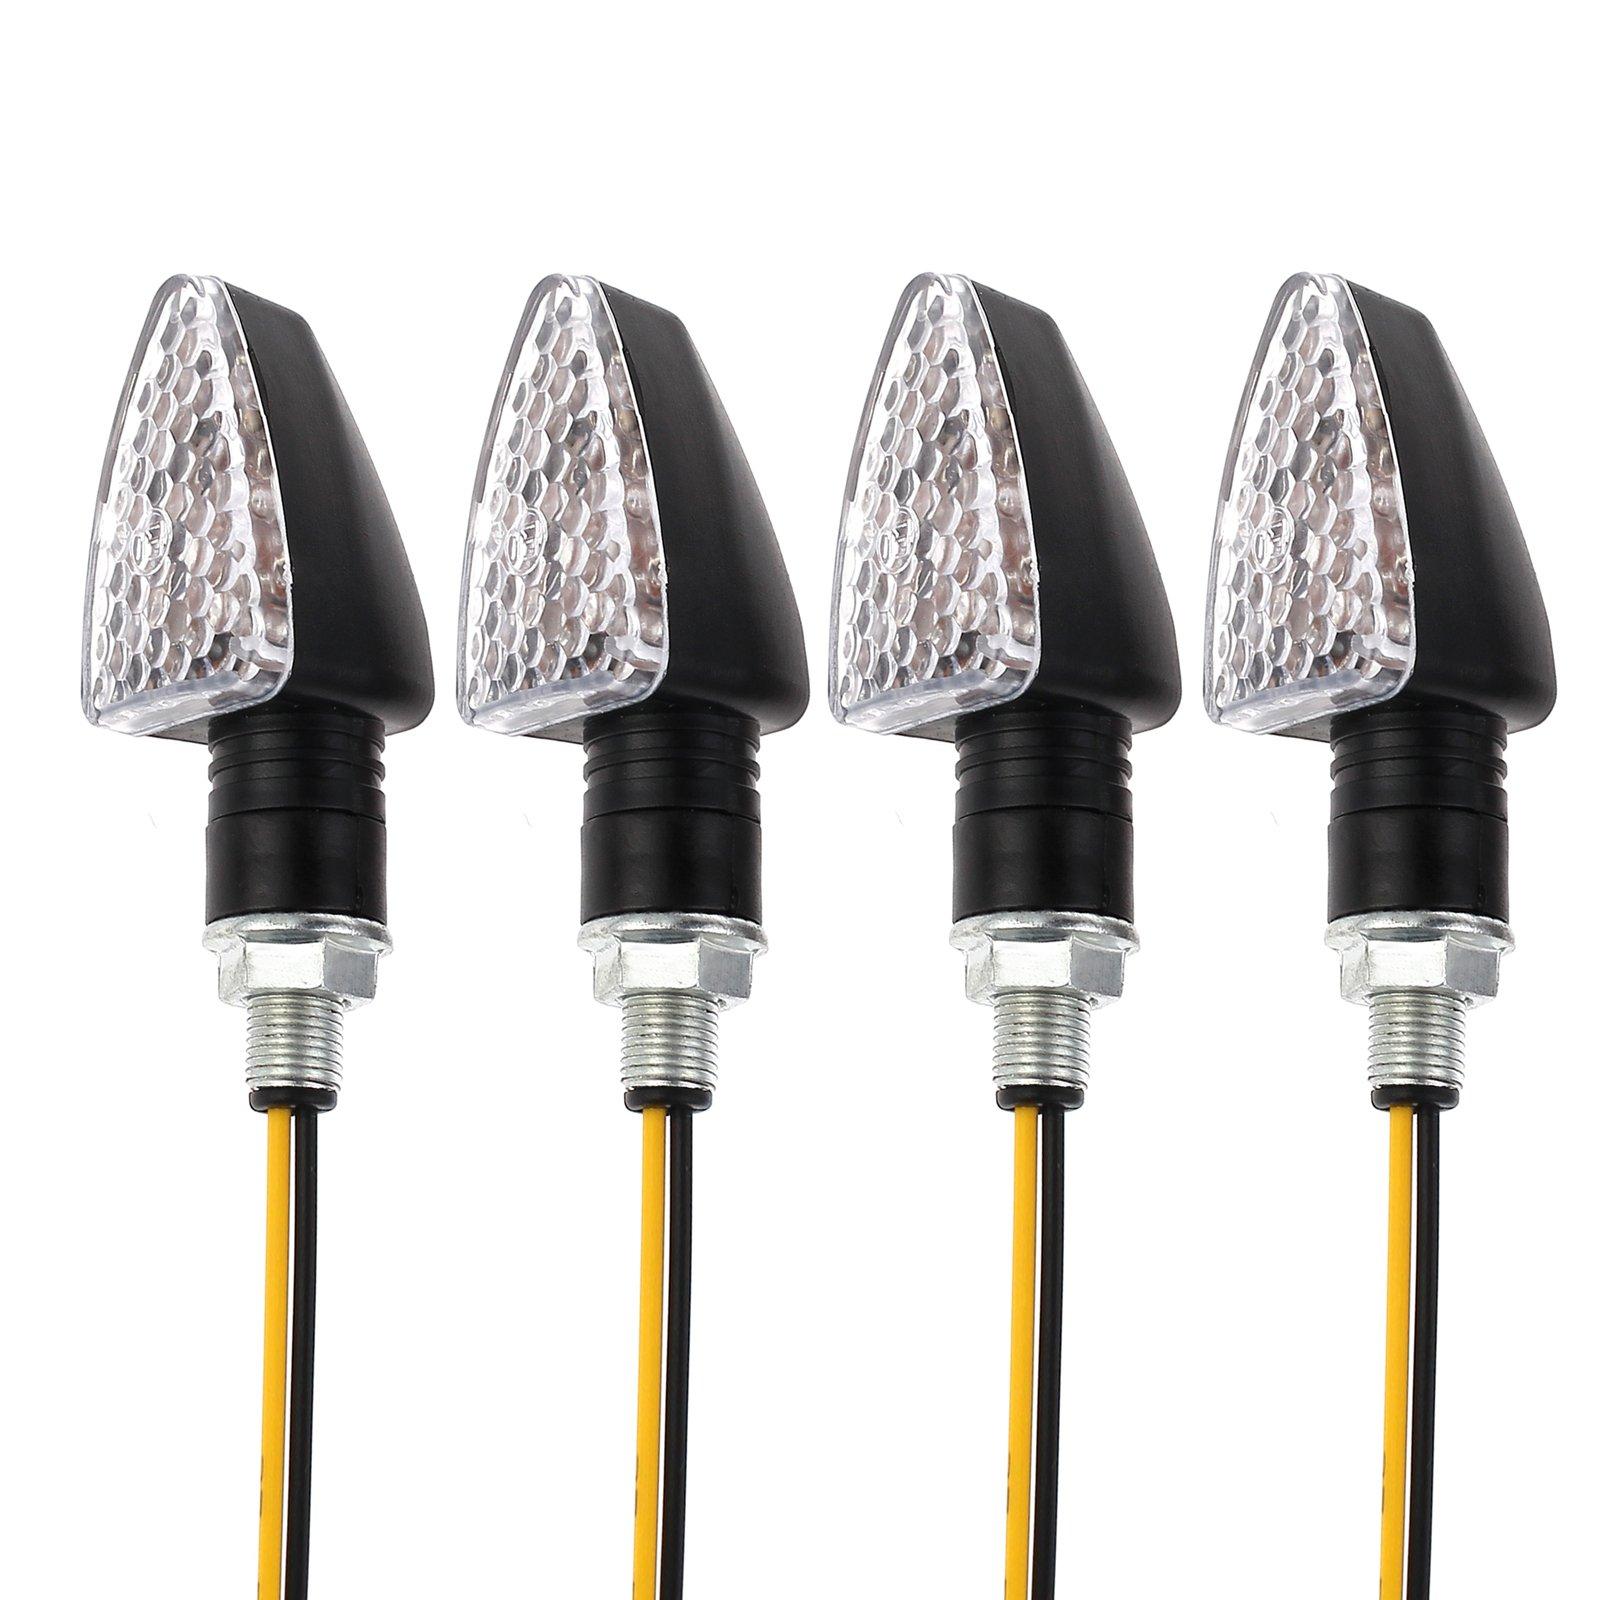 Best Rated In Motorbike Lighting Helpful Customer Reviews Amazon Motorcycle Wiring Diagram 24v Lights Turn Signals Light 4 Pcs Waterproof 15 Led Mini Lamp